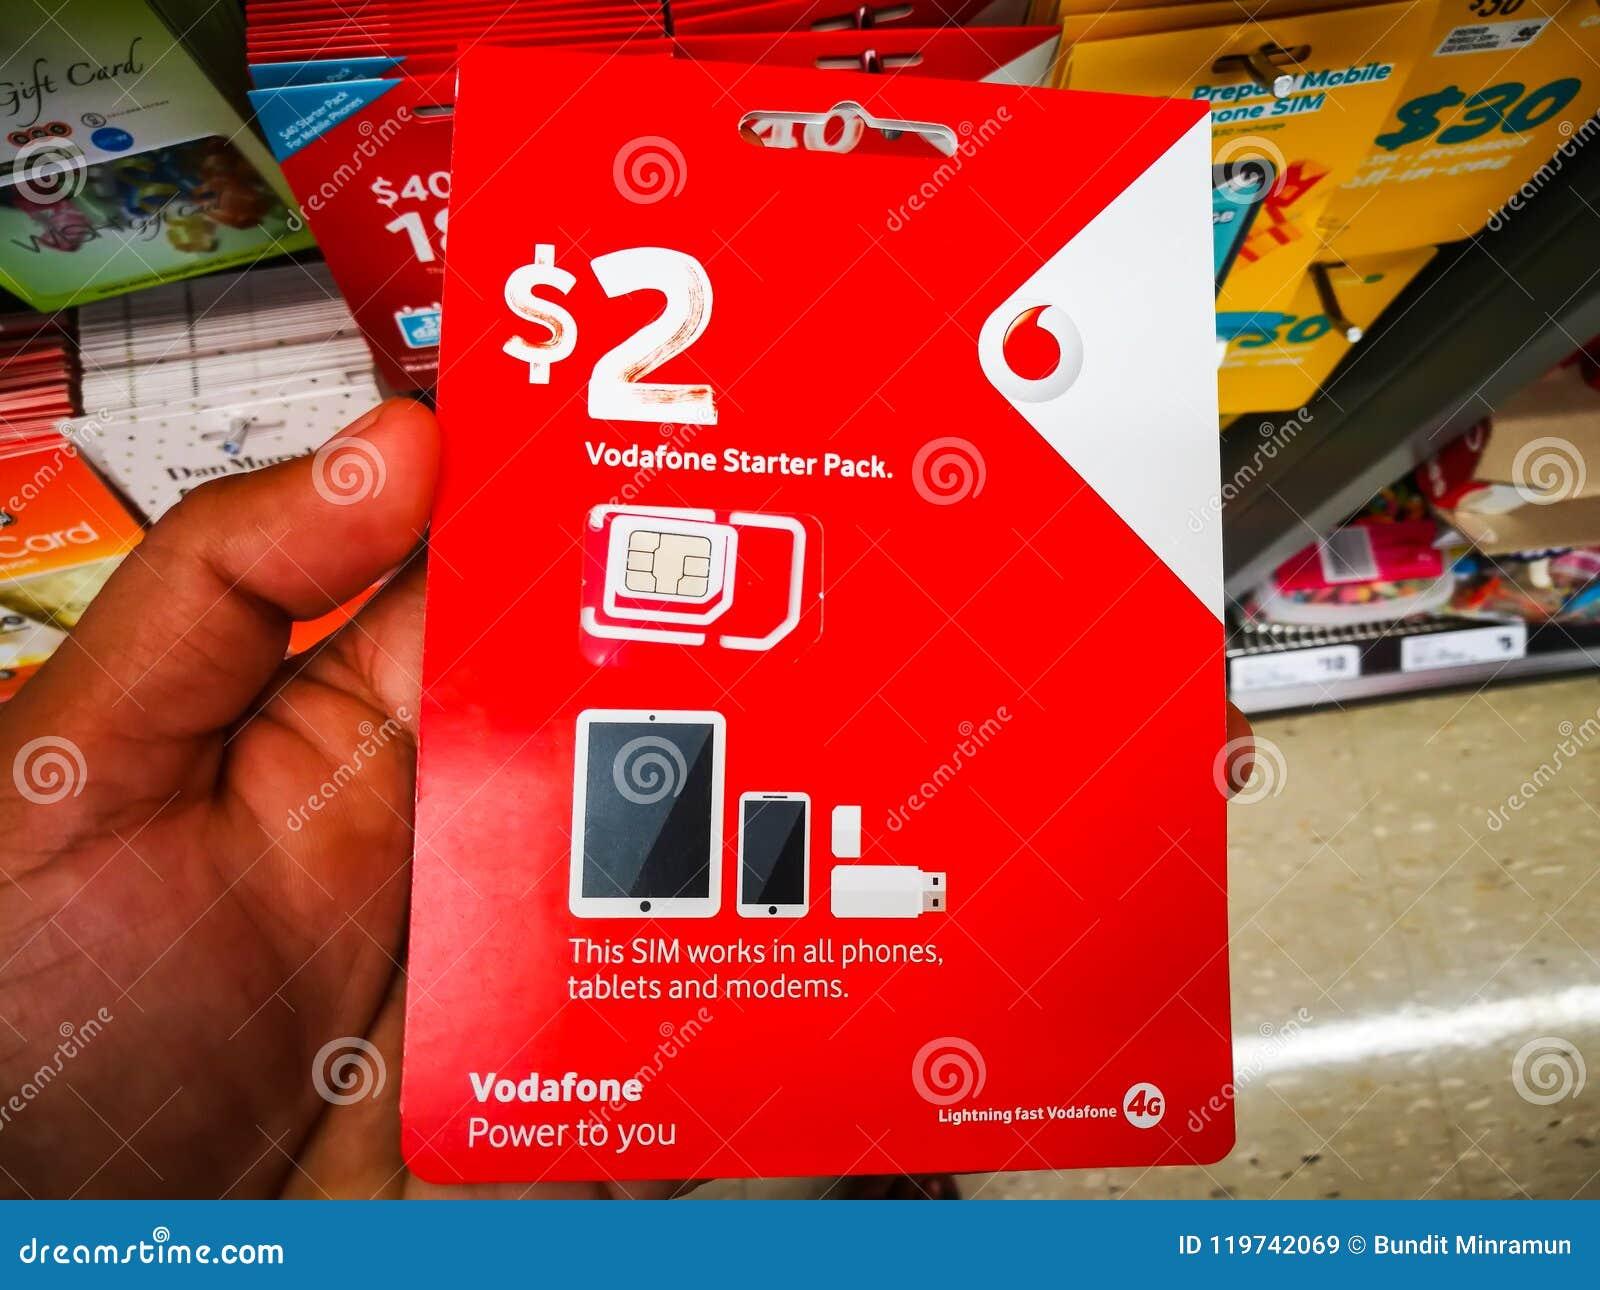 Vodafone Sim Card 2 Dollar Prepaid Starter Pack Works In All